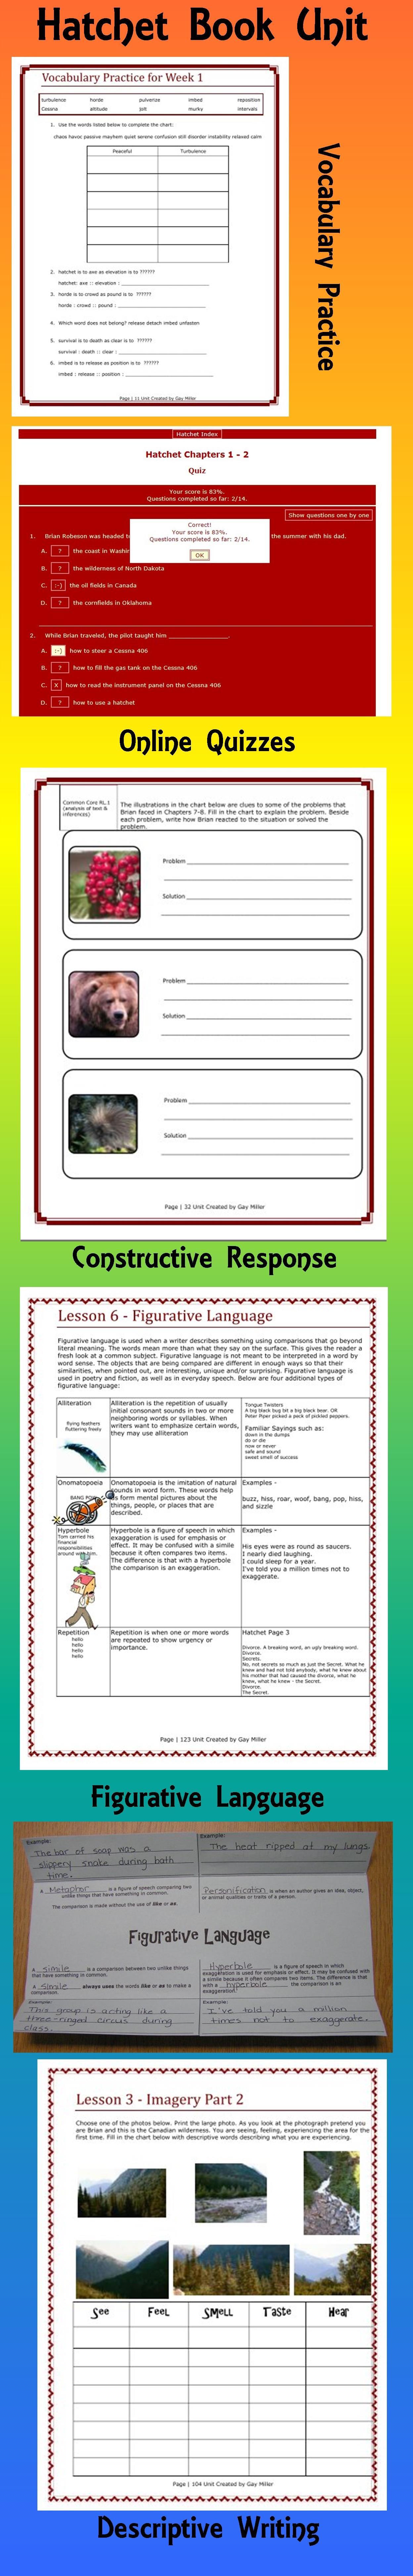 Hatchet Novel Study Digital Printable Book Unit Activities Amp Quizzes